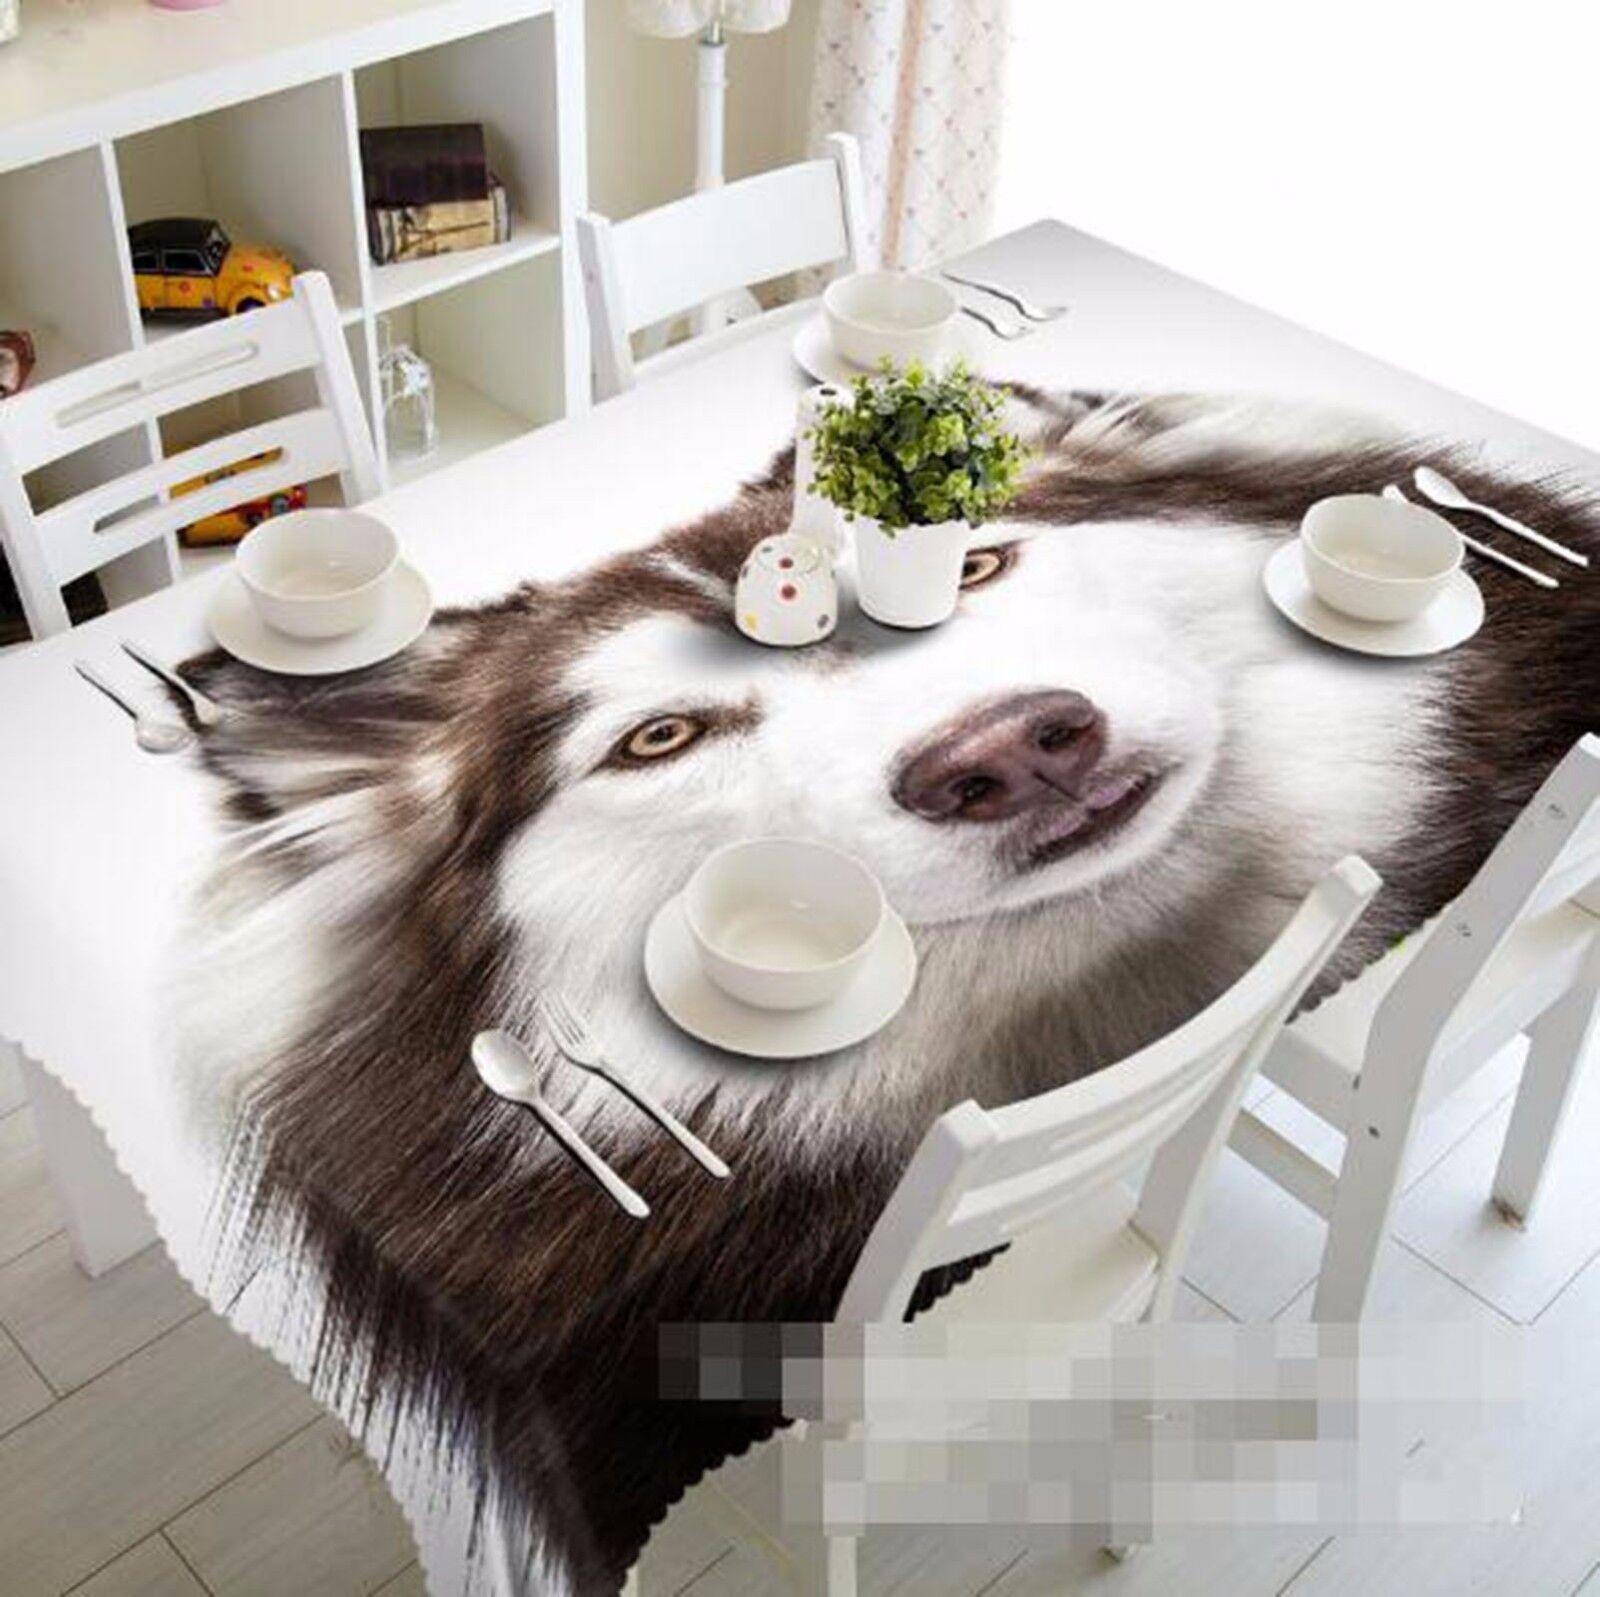 3D Husky Mantel Mantel Paño Cumpleaños Fiesta AJ Wallpaper Reino Unido Limón